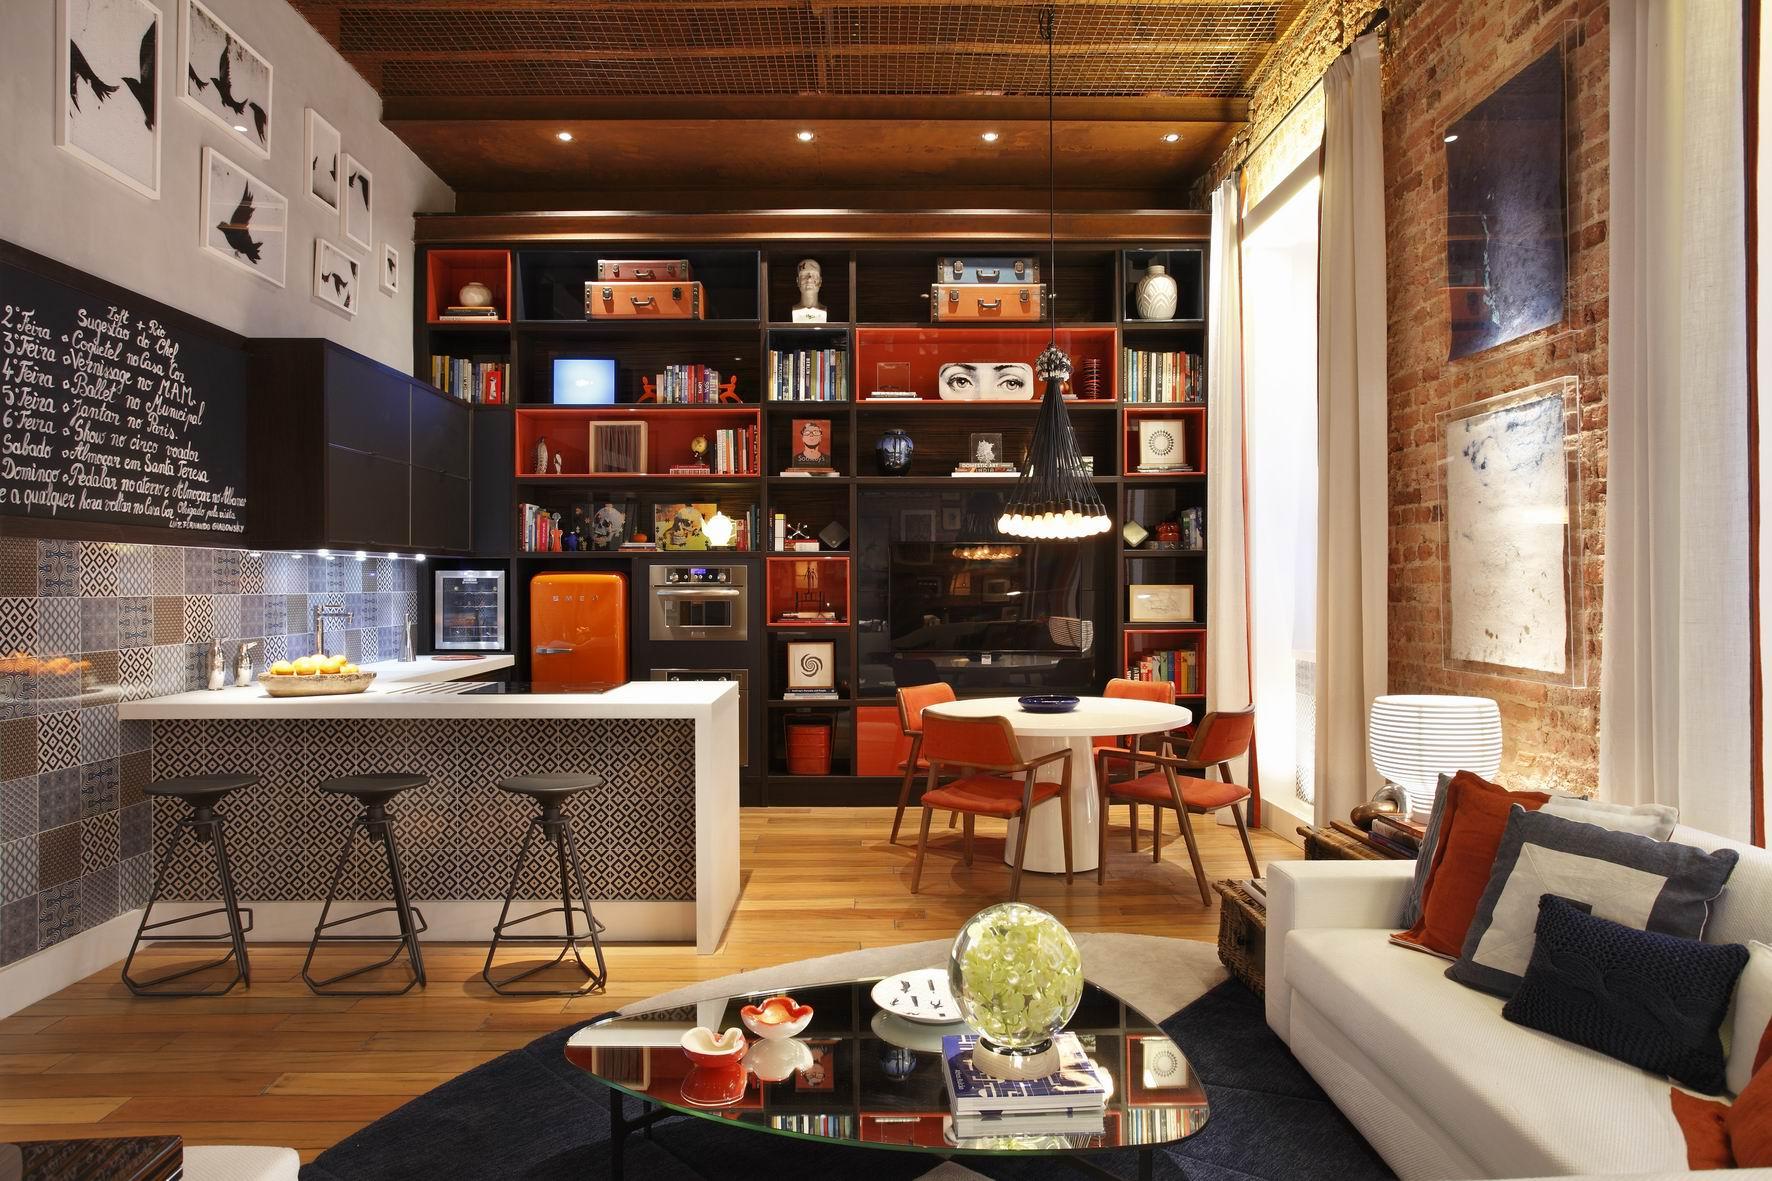 Elegant Organization Ideas for Sofa Tables with Storage